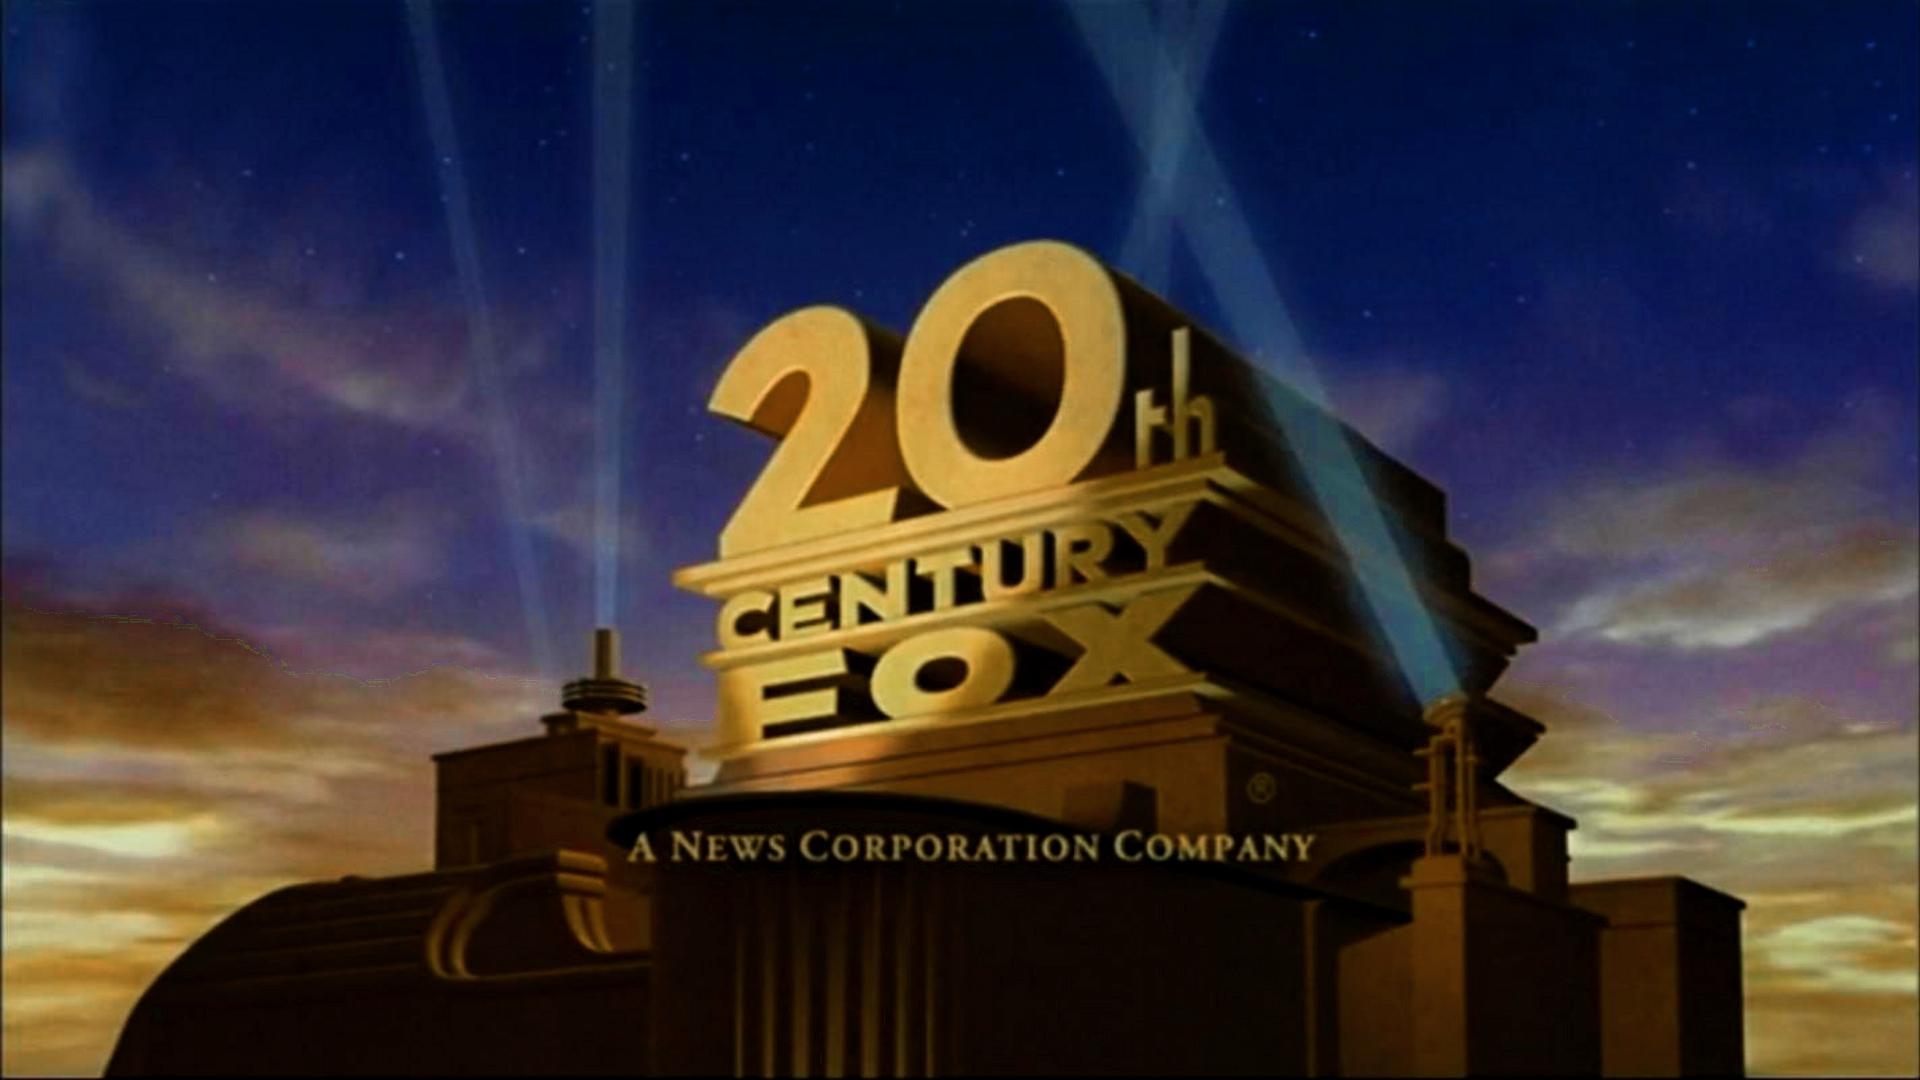 Best 46+ 20th Century Fox Wallpaper on HipWallpaper.